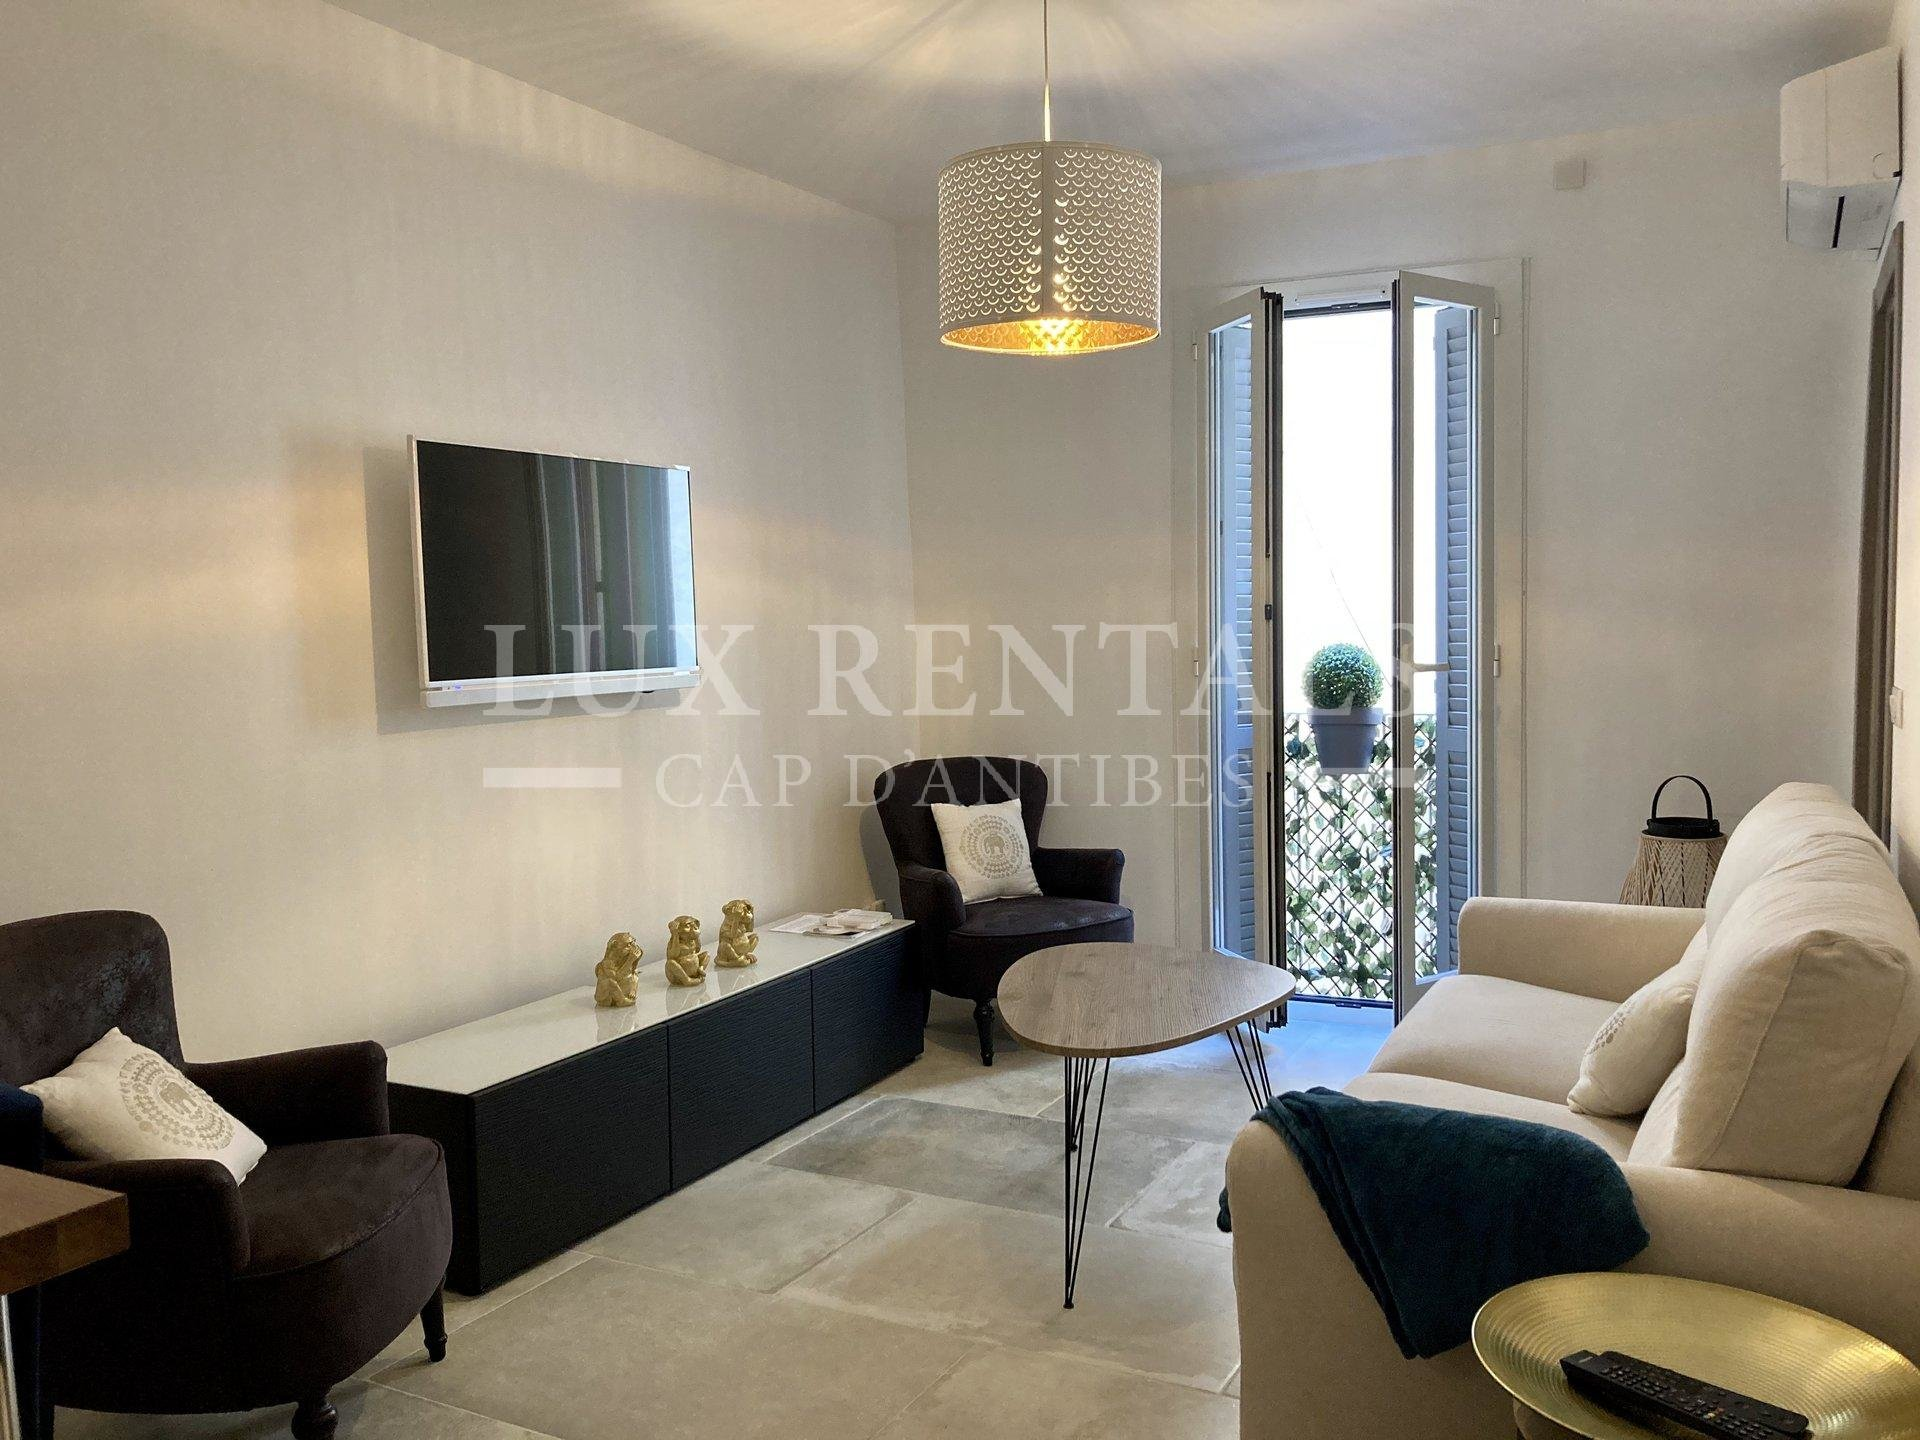 Vente Appartement - Antibes Vieil Antibes